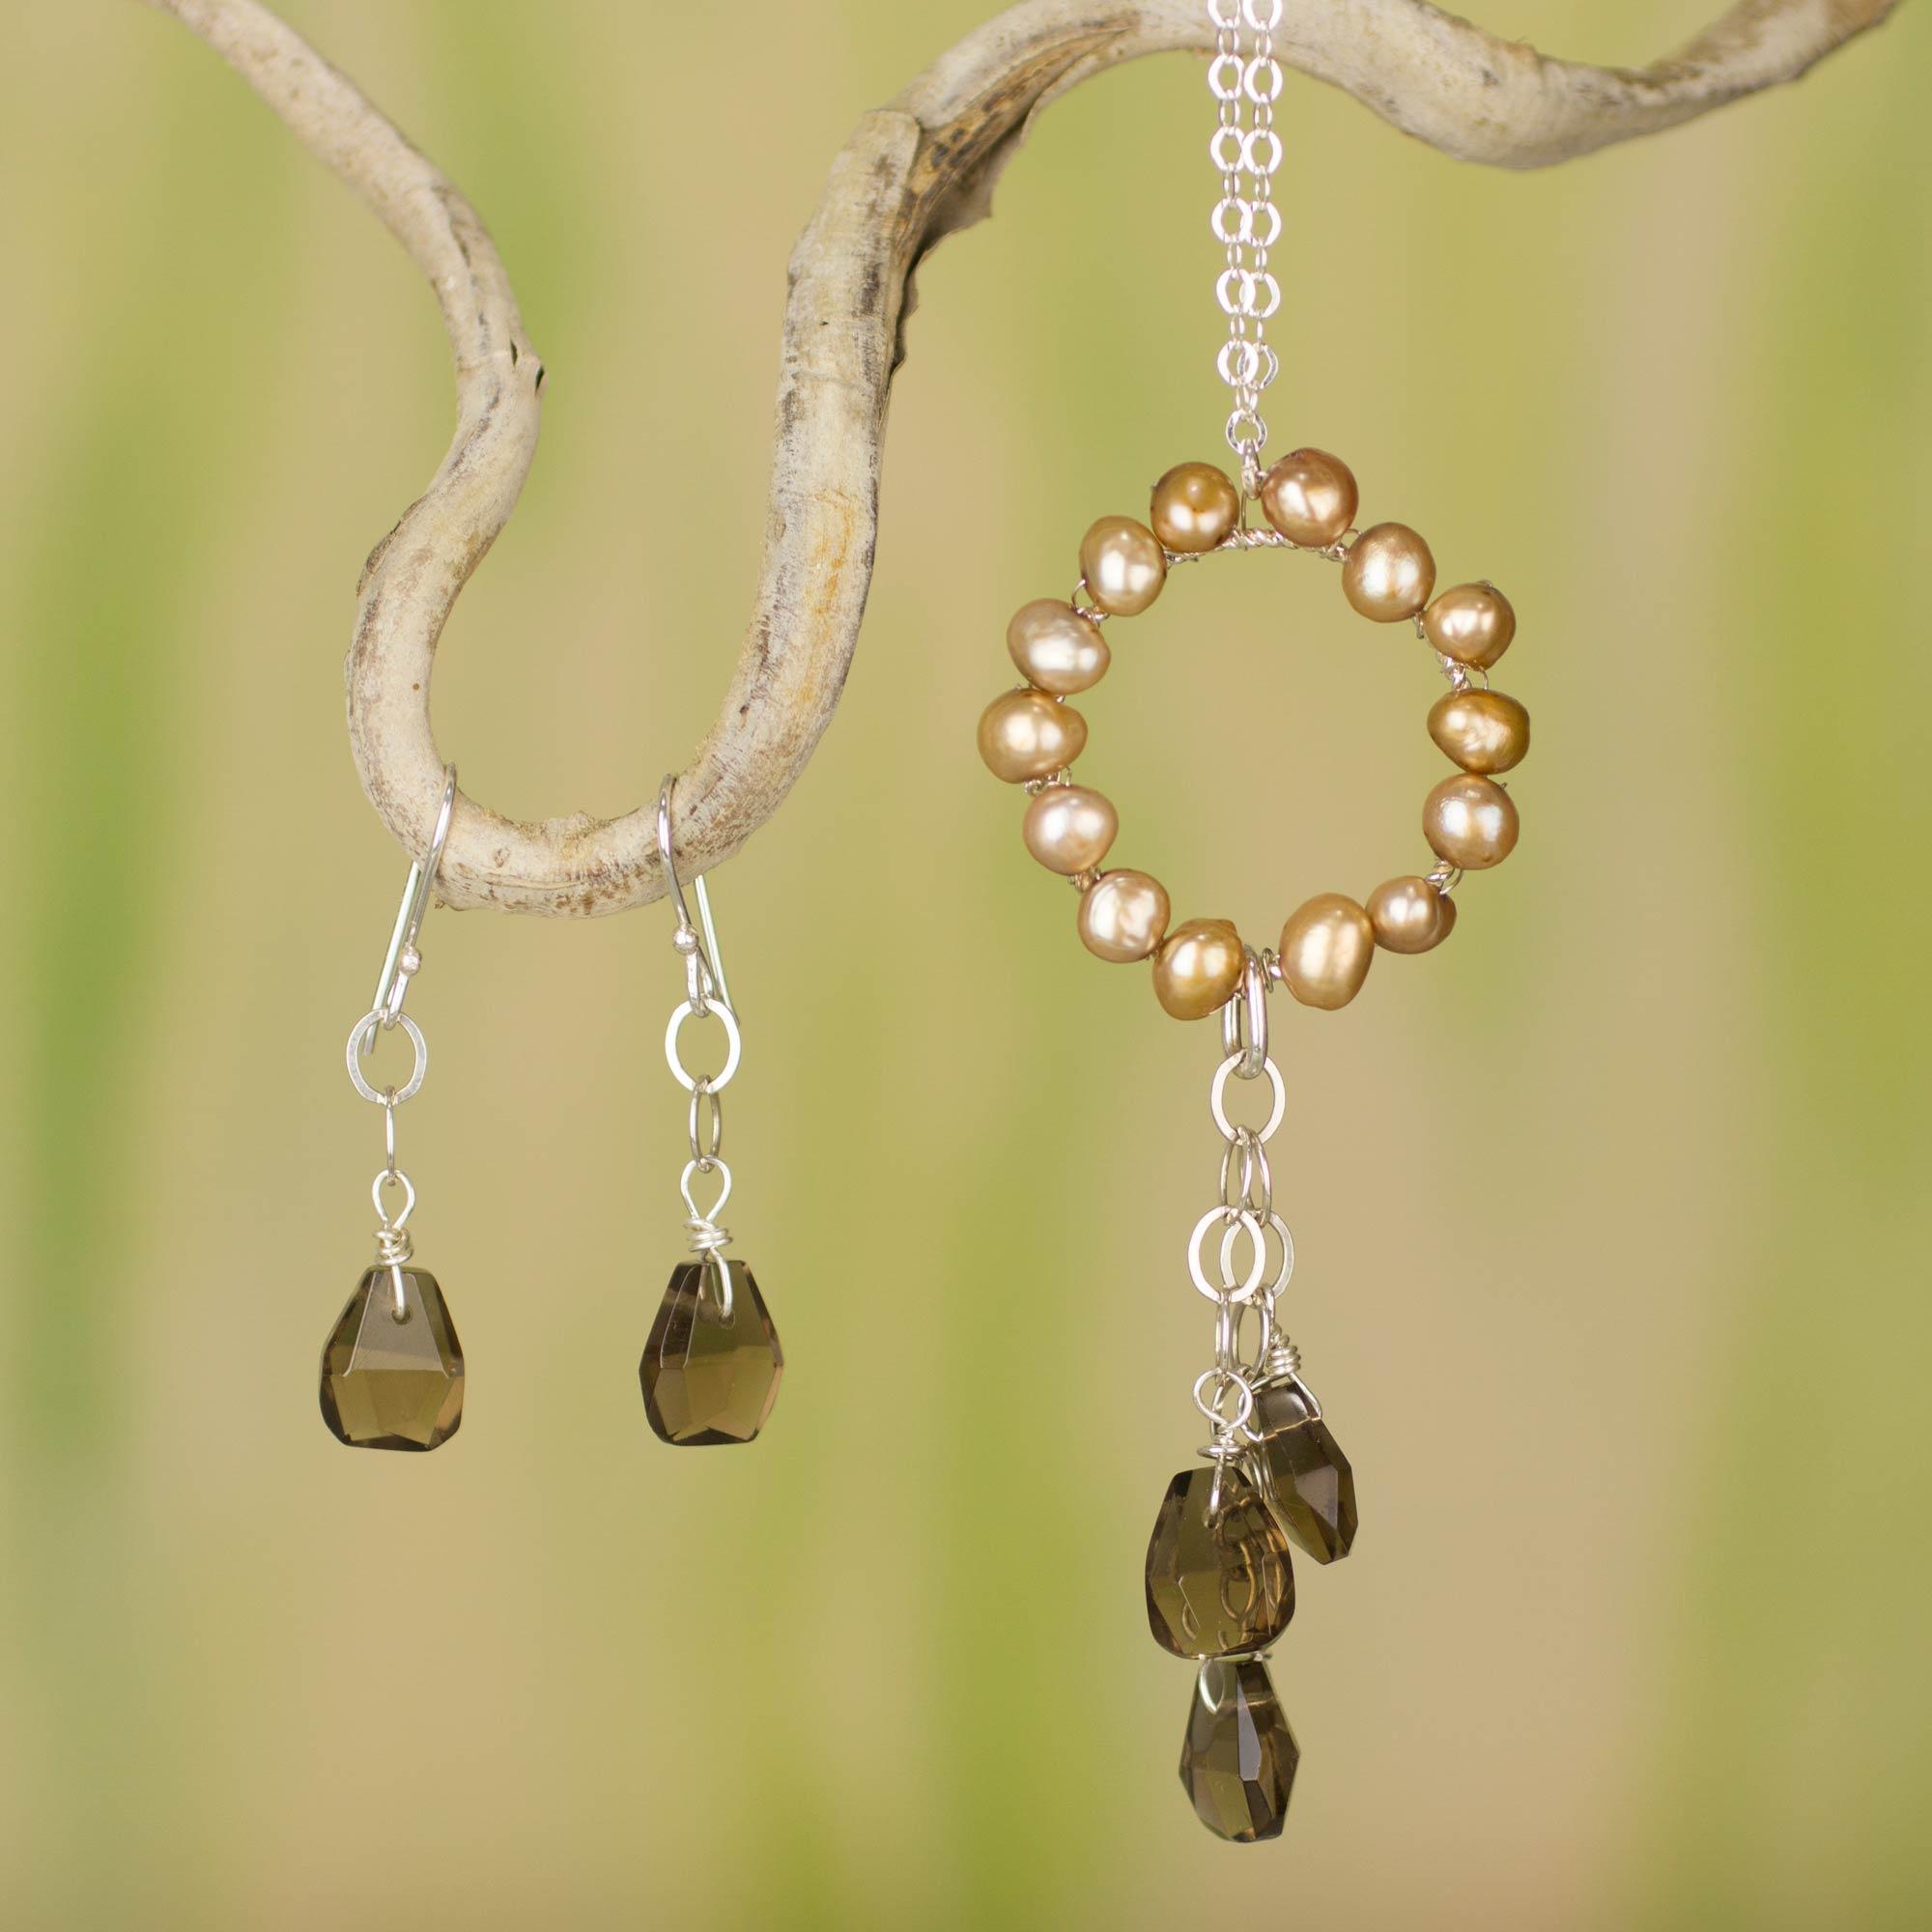 Pearl Smoky Quartz Jewelry Set From Mexico Waterfall Novica